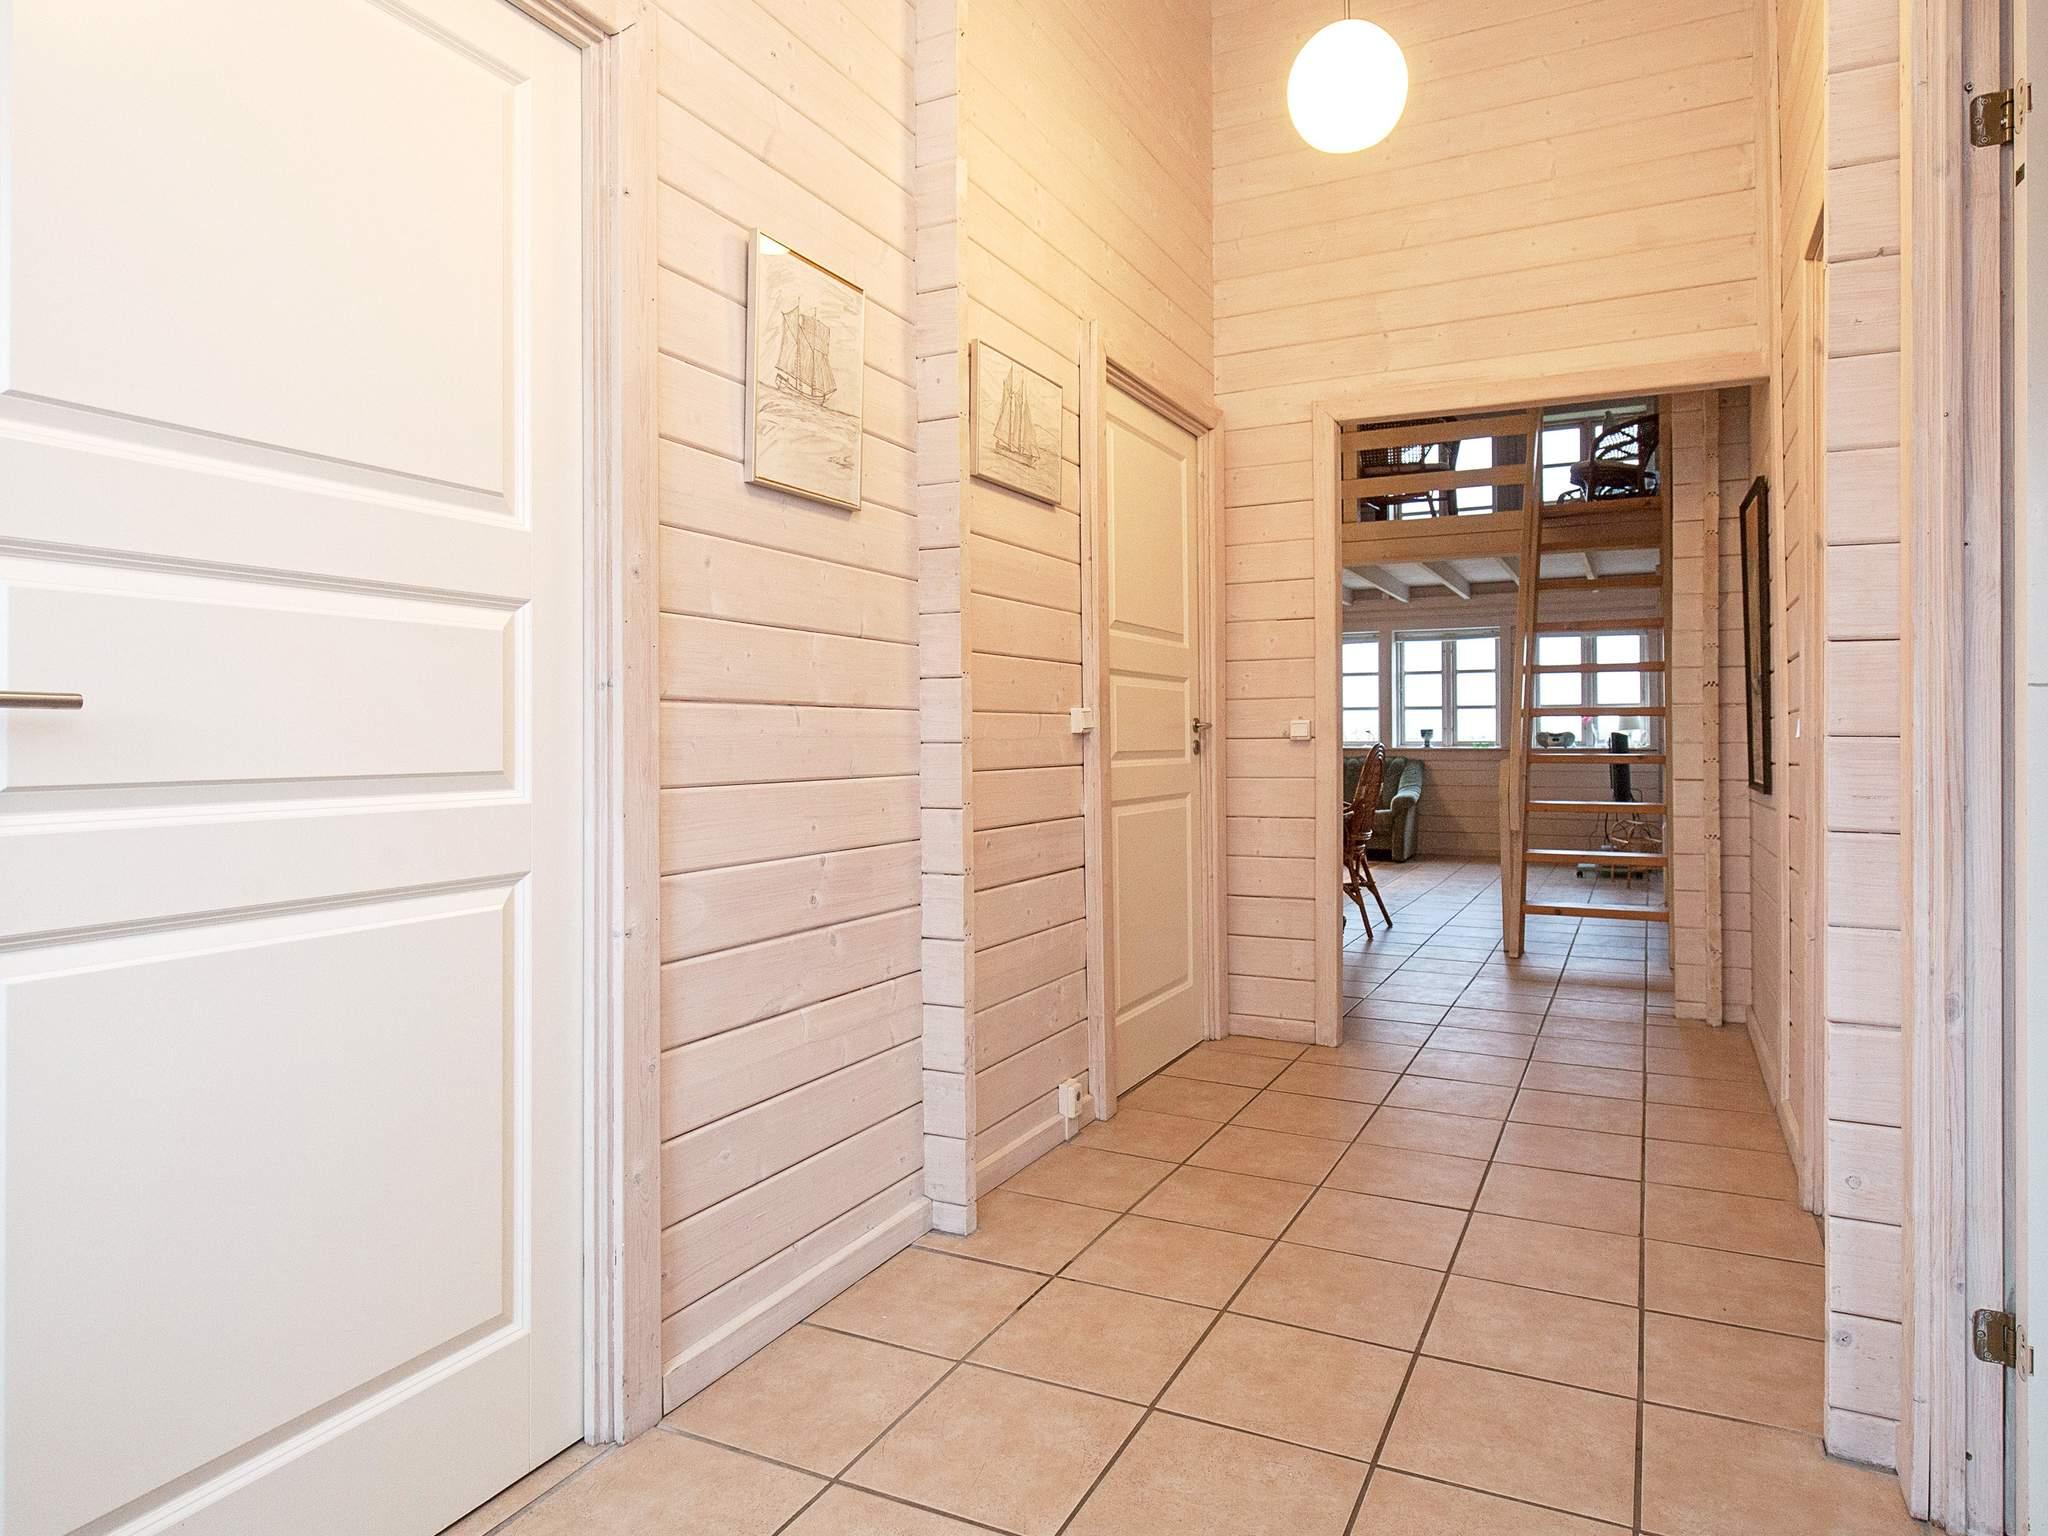 Ferienhaus Røsnæs (264063), Kalundborg, , Westseeland, Dänemark, Bild 14